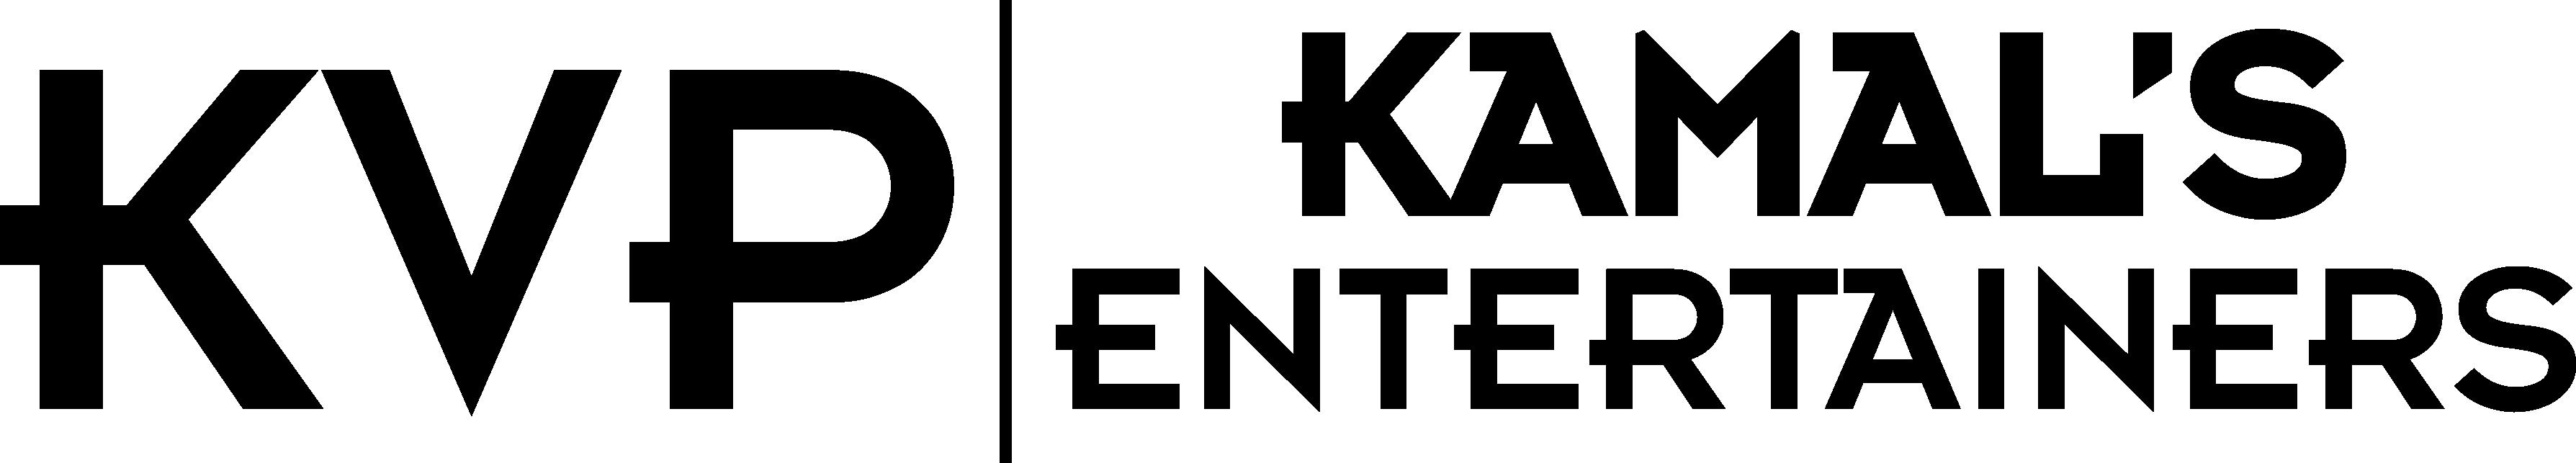 KVP_(1)_(2).png